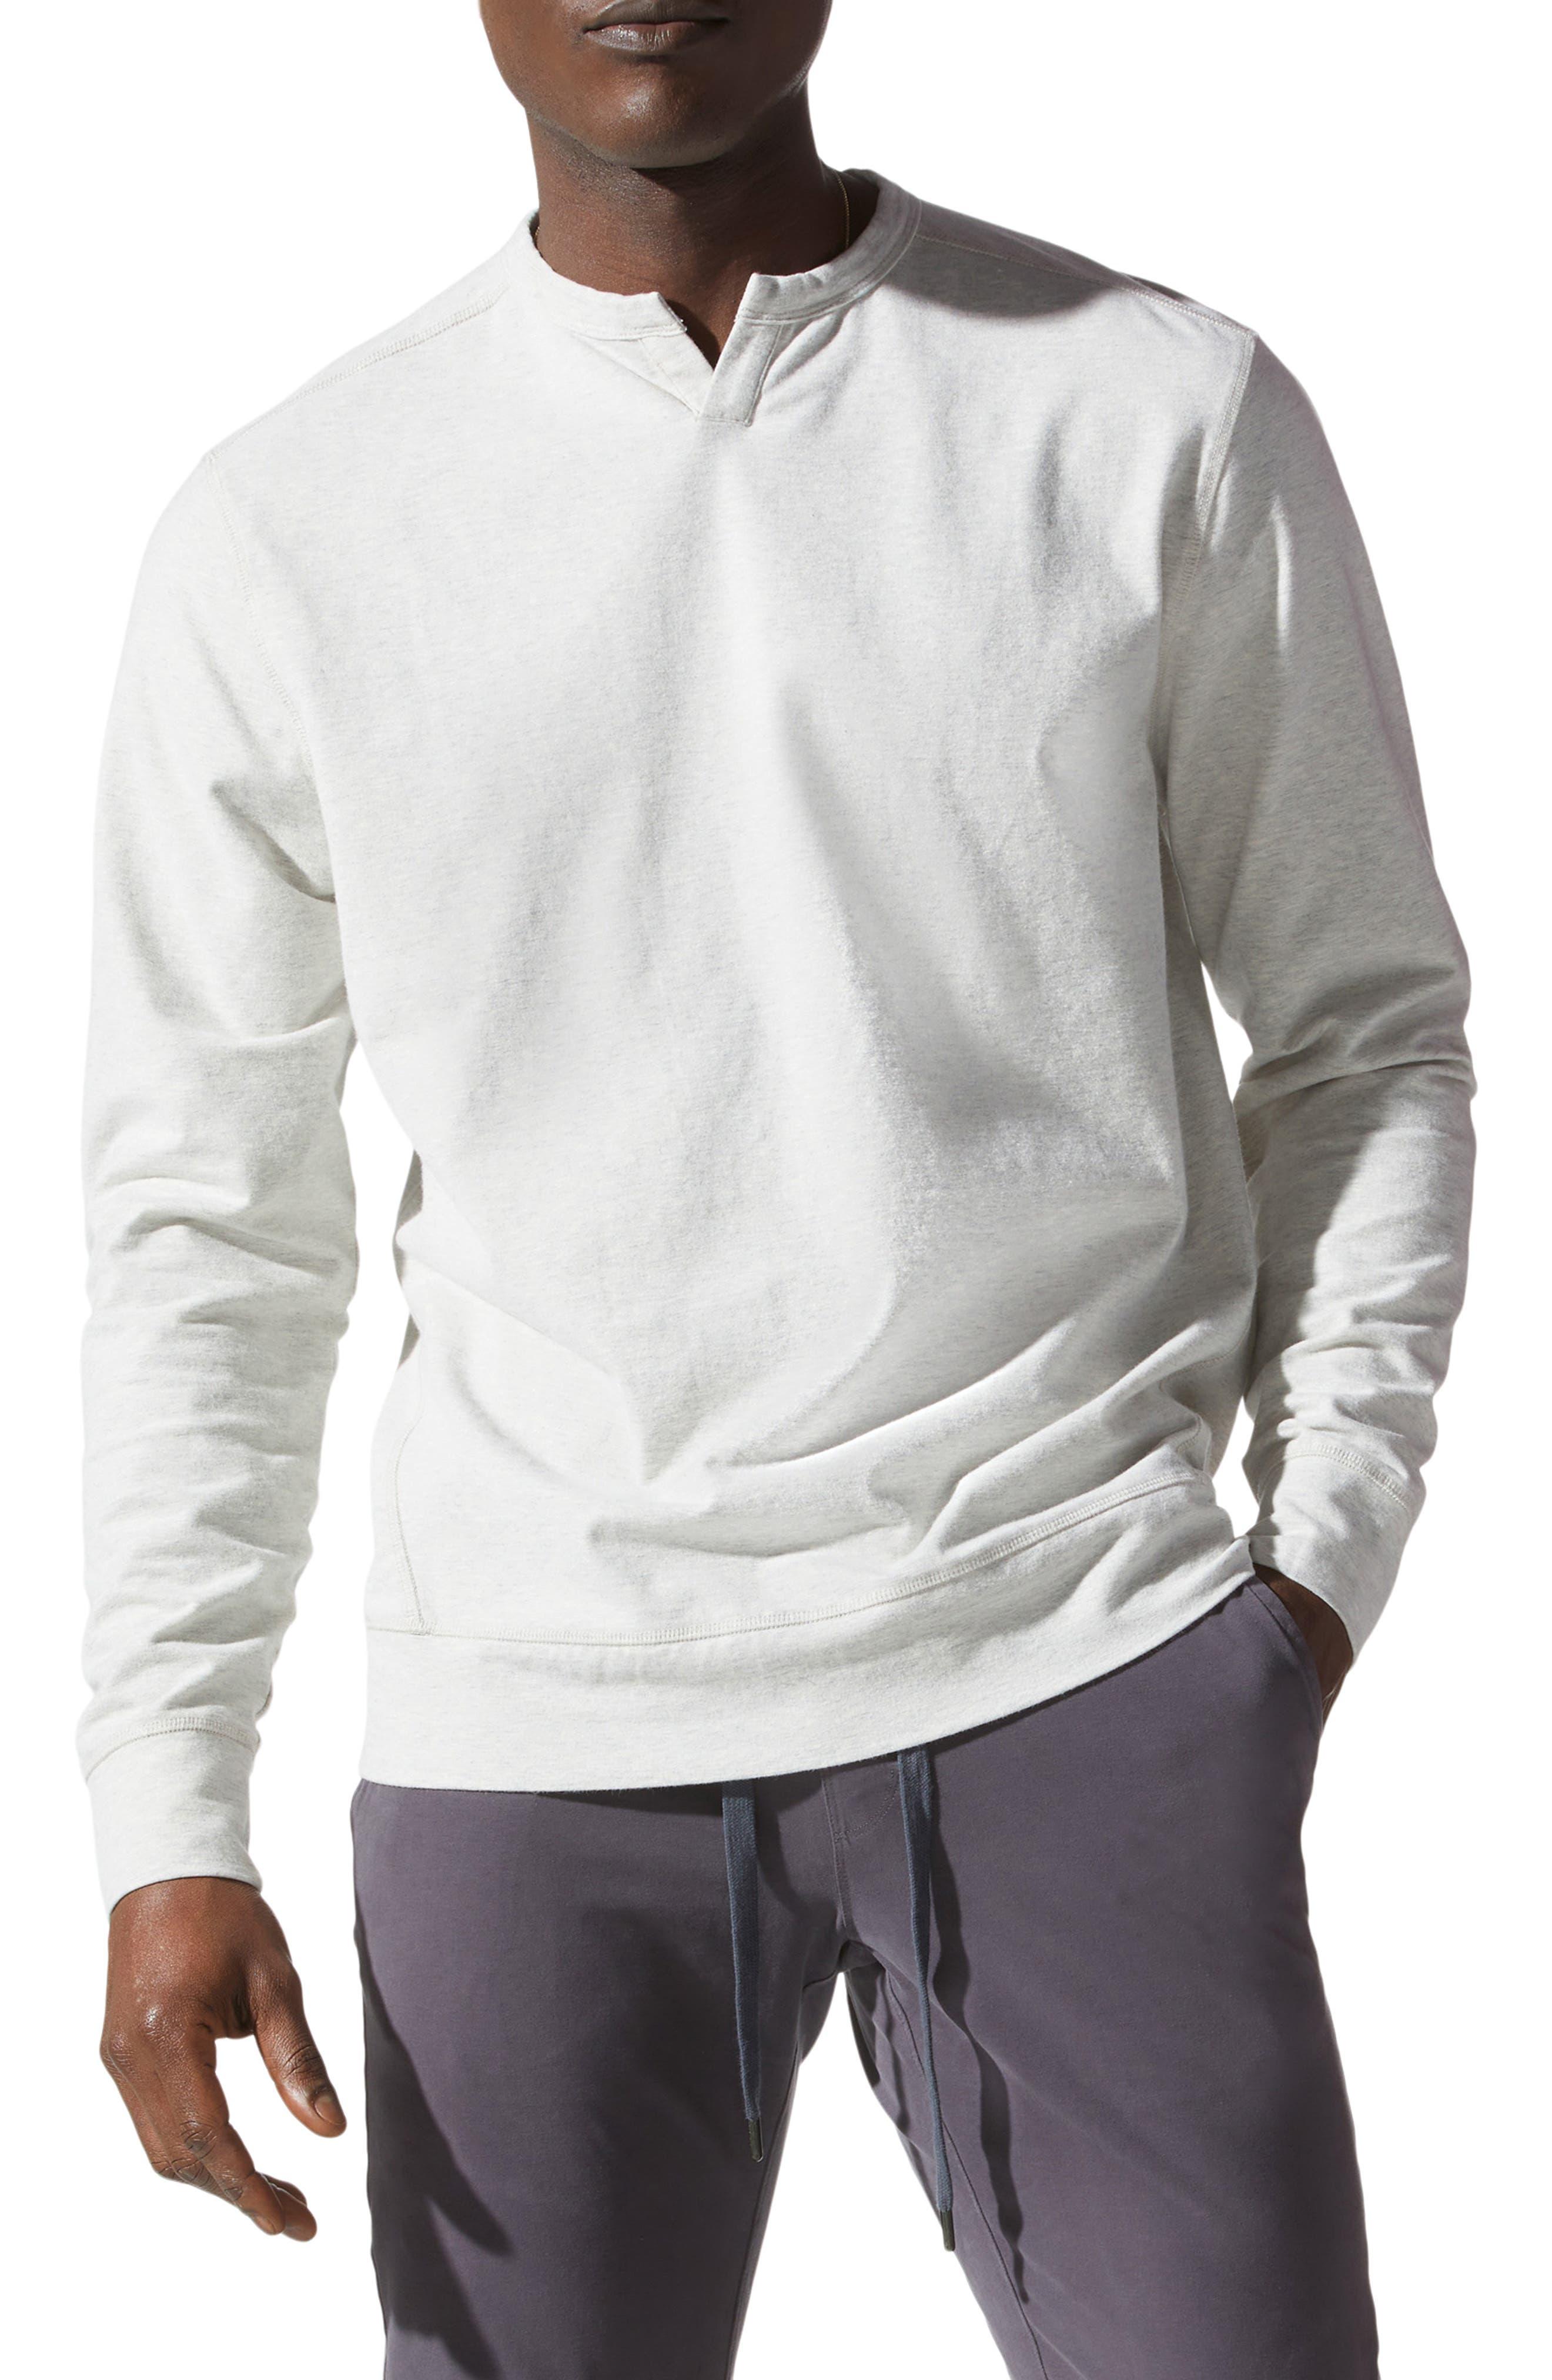 Flex Pro Victory V-Notch Heathered Sweatshirt